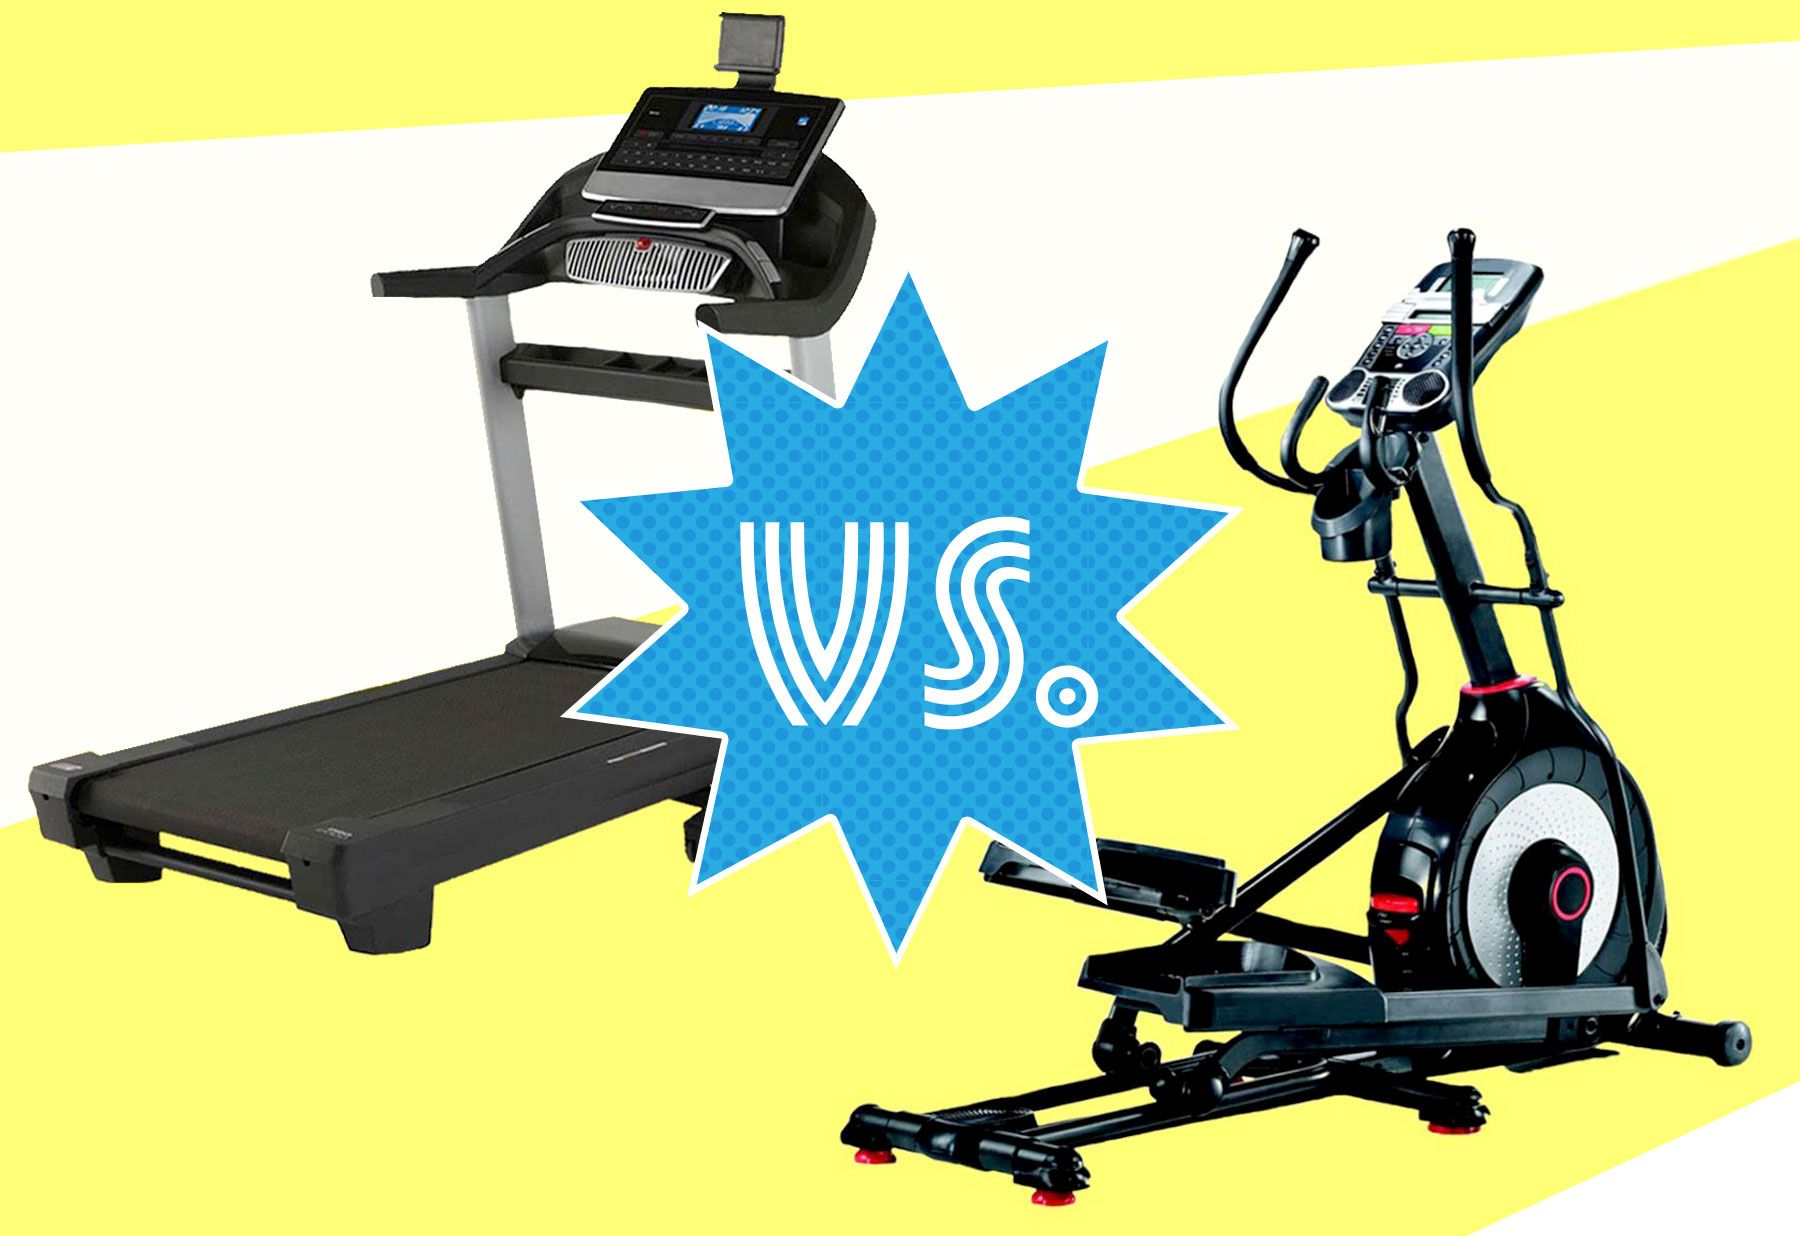 Treadmill Vs Elliptical When To Use The Treadmill Or Elliptical